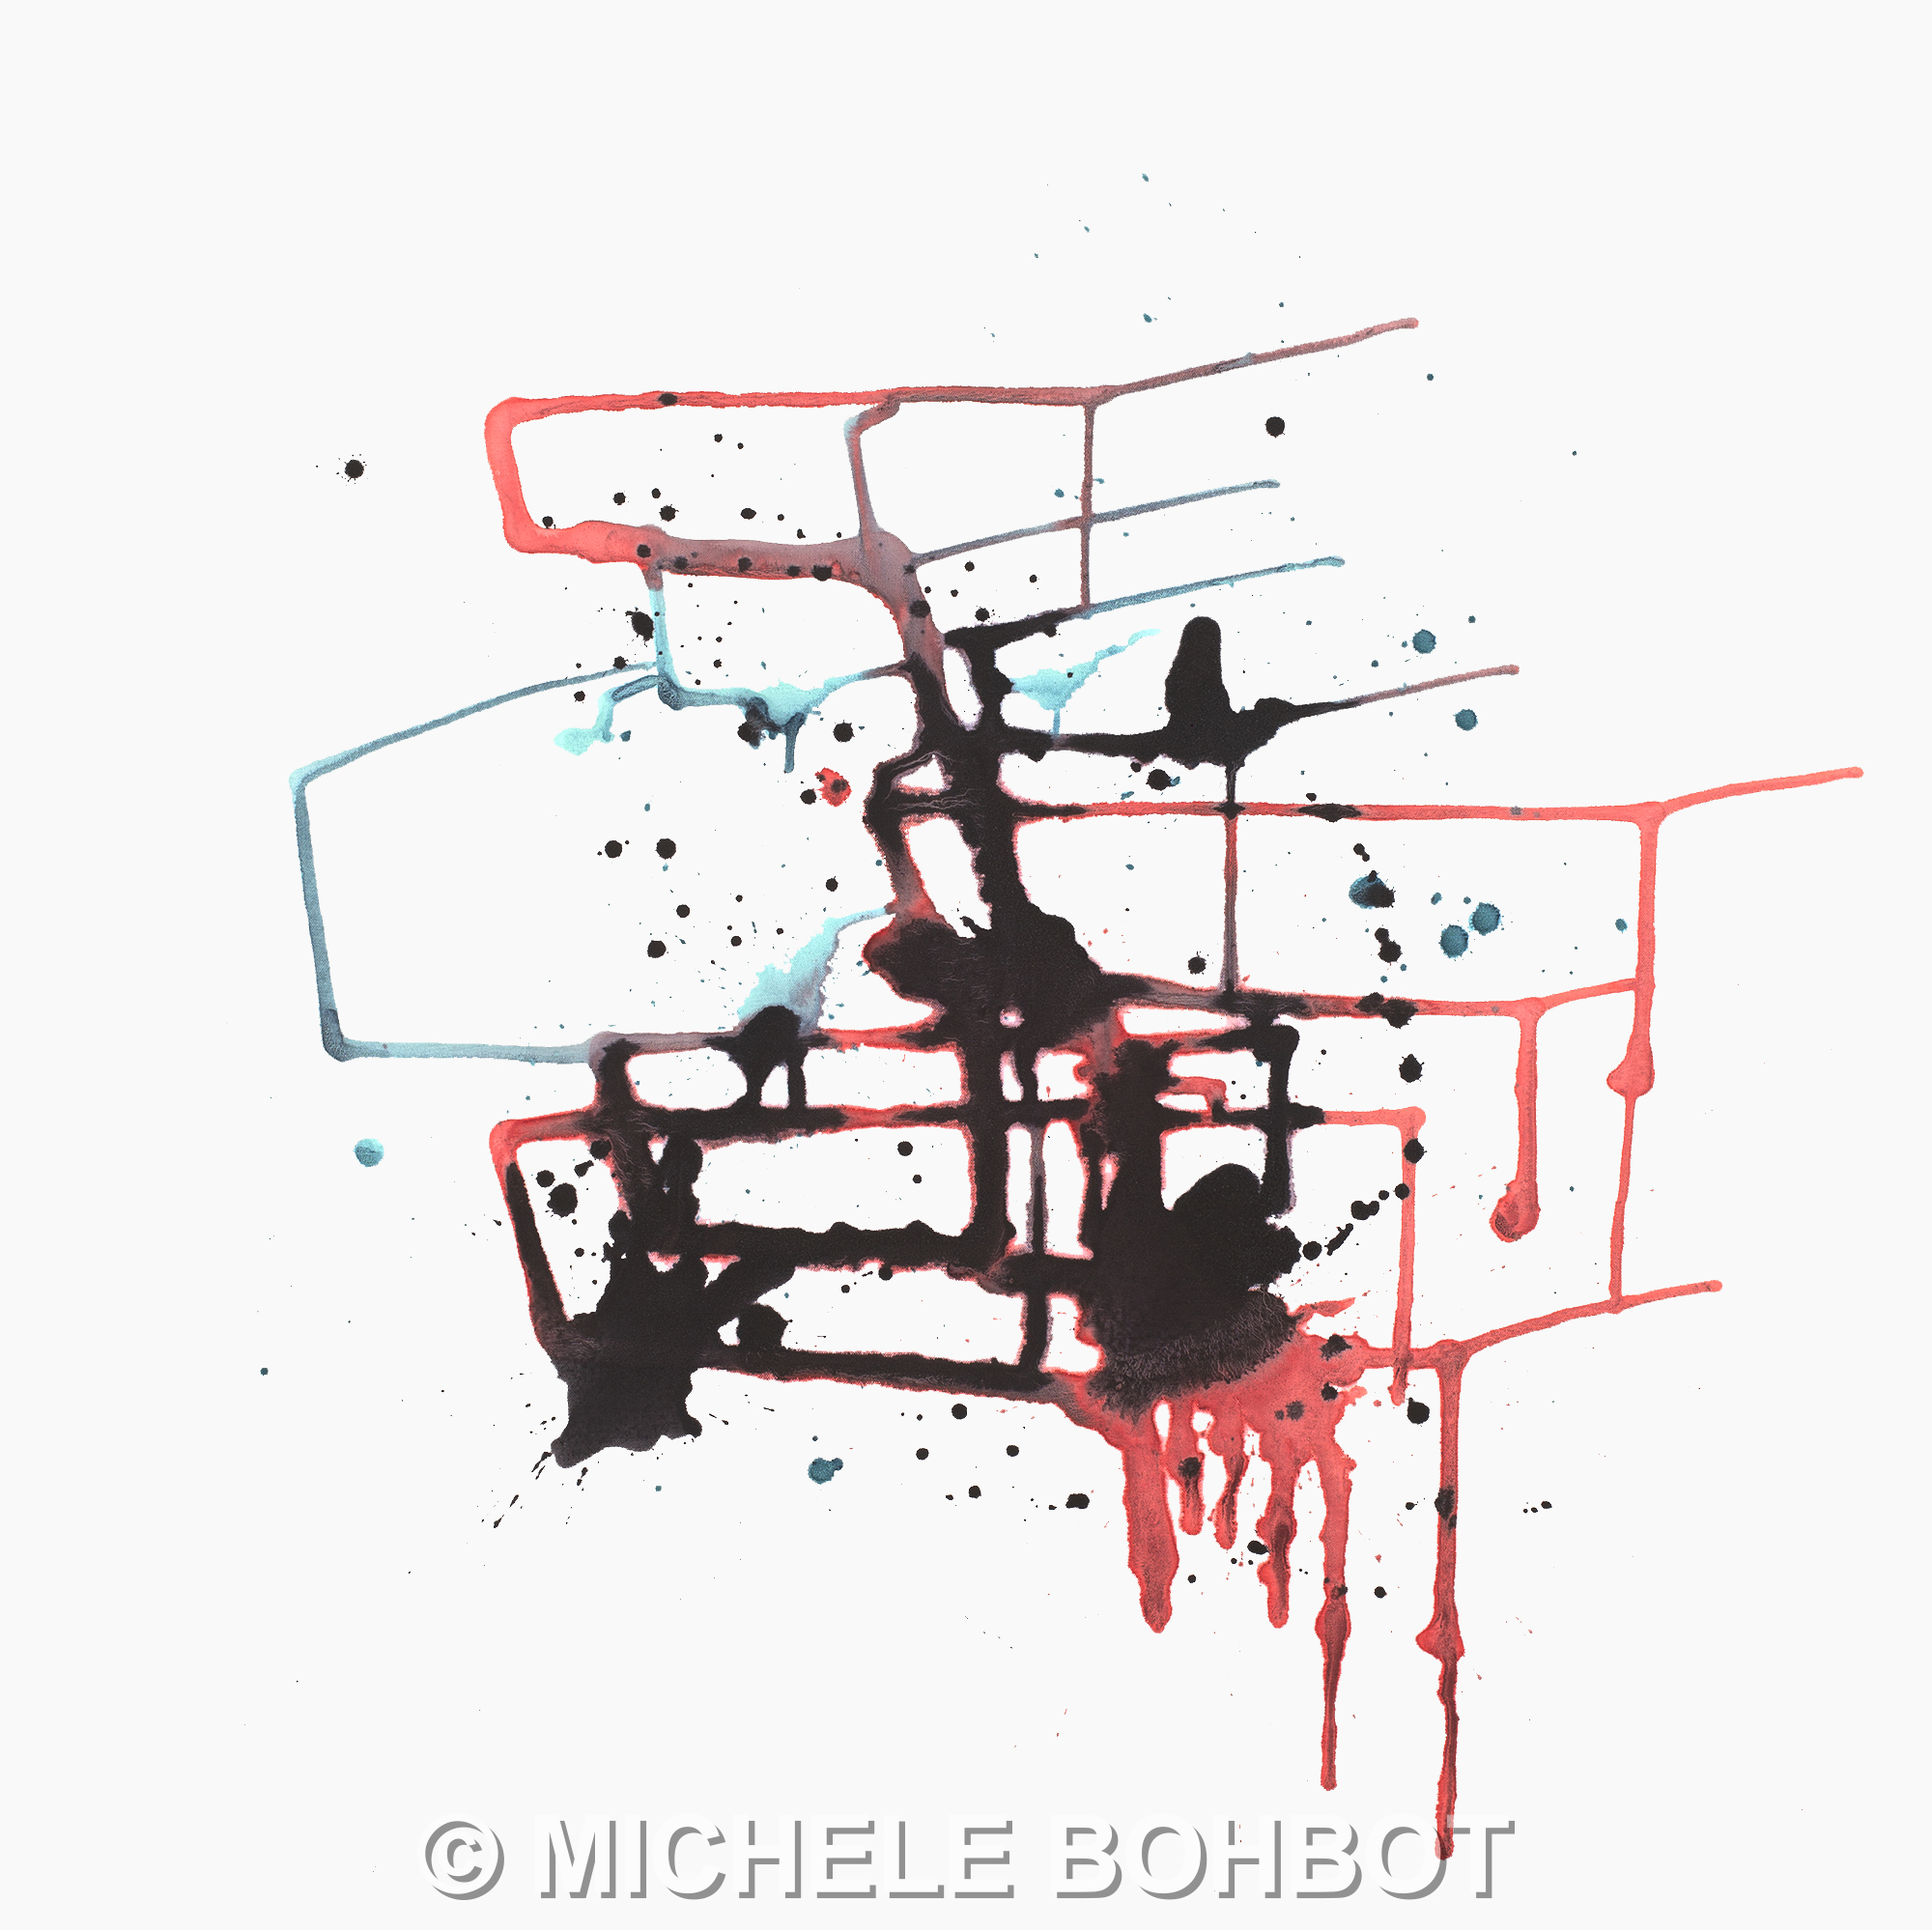 Michele A. Bohbot (4-13-19)_10_lg-1-1gGR.jpg